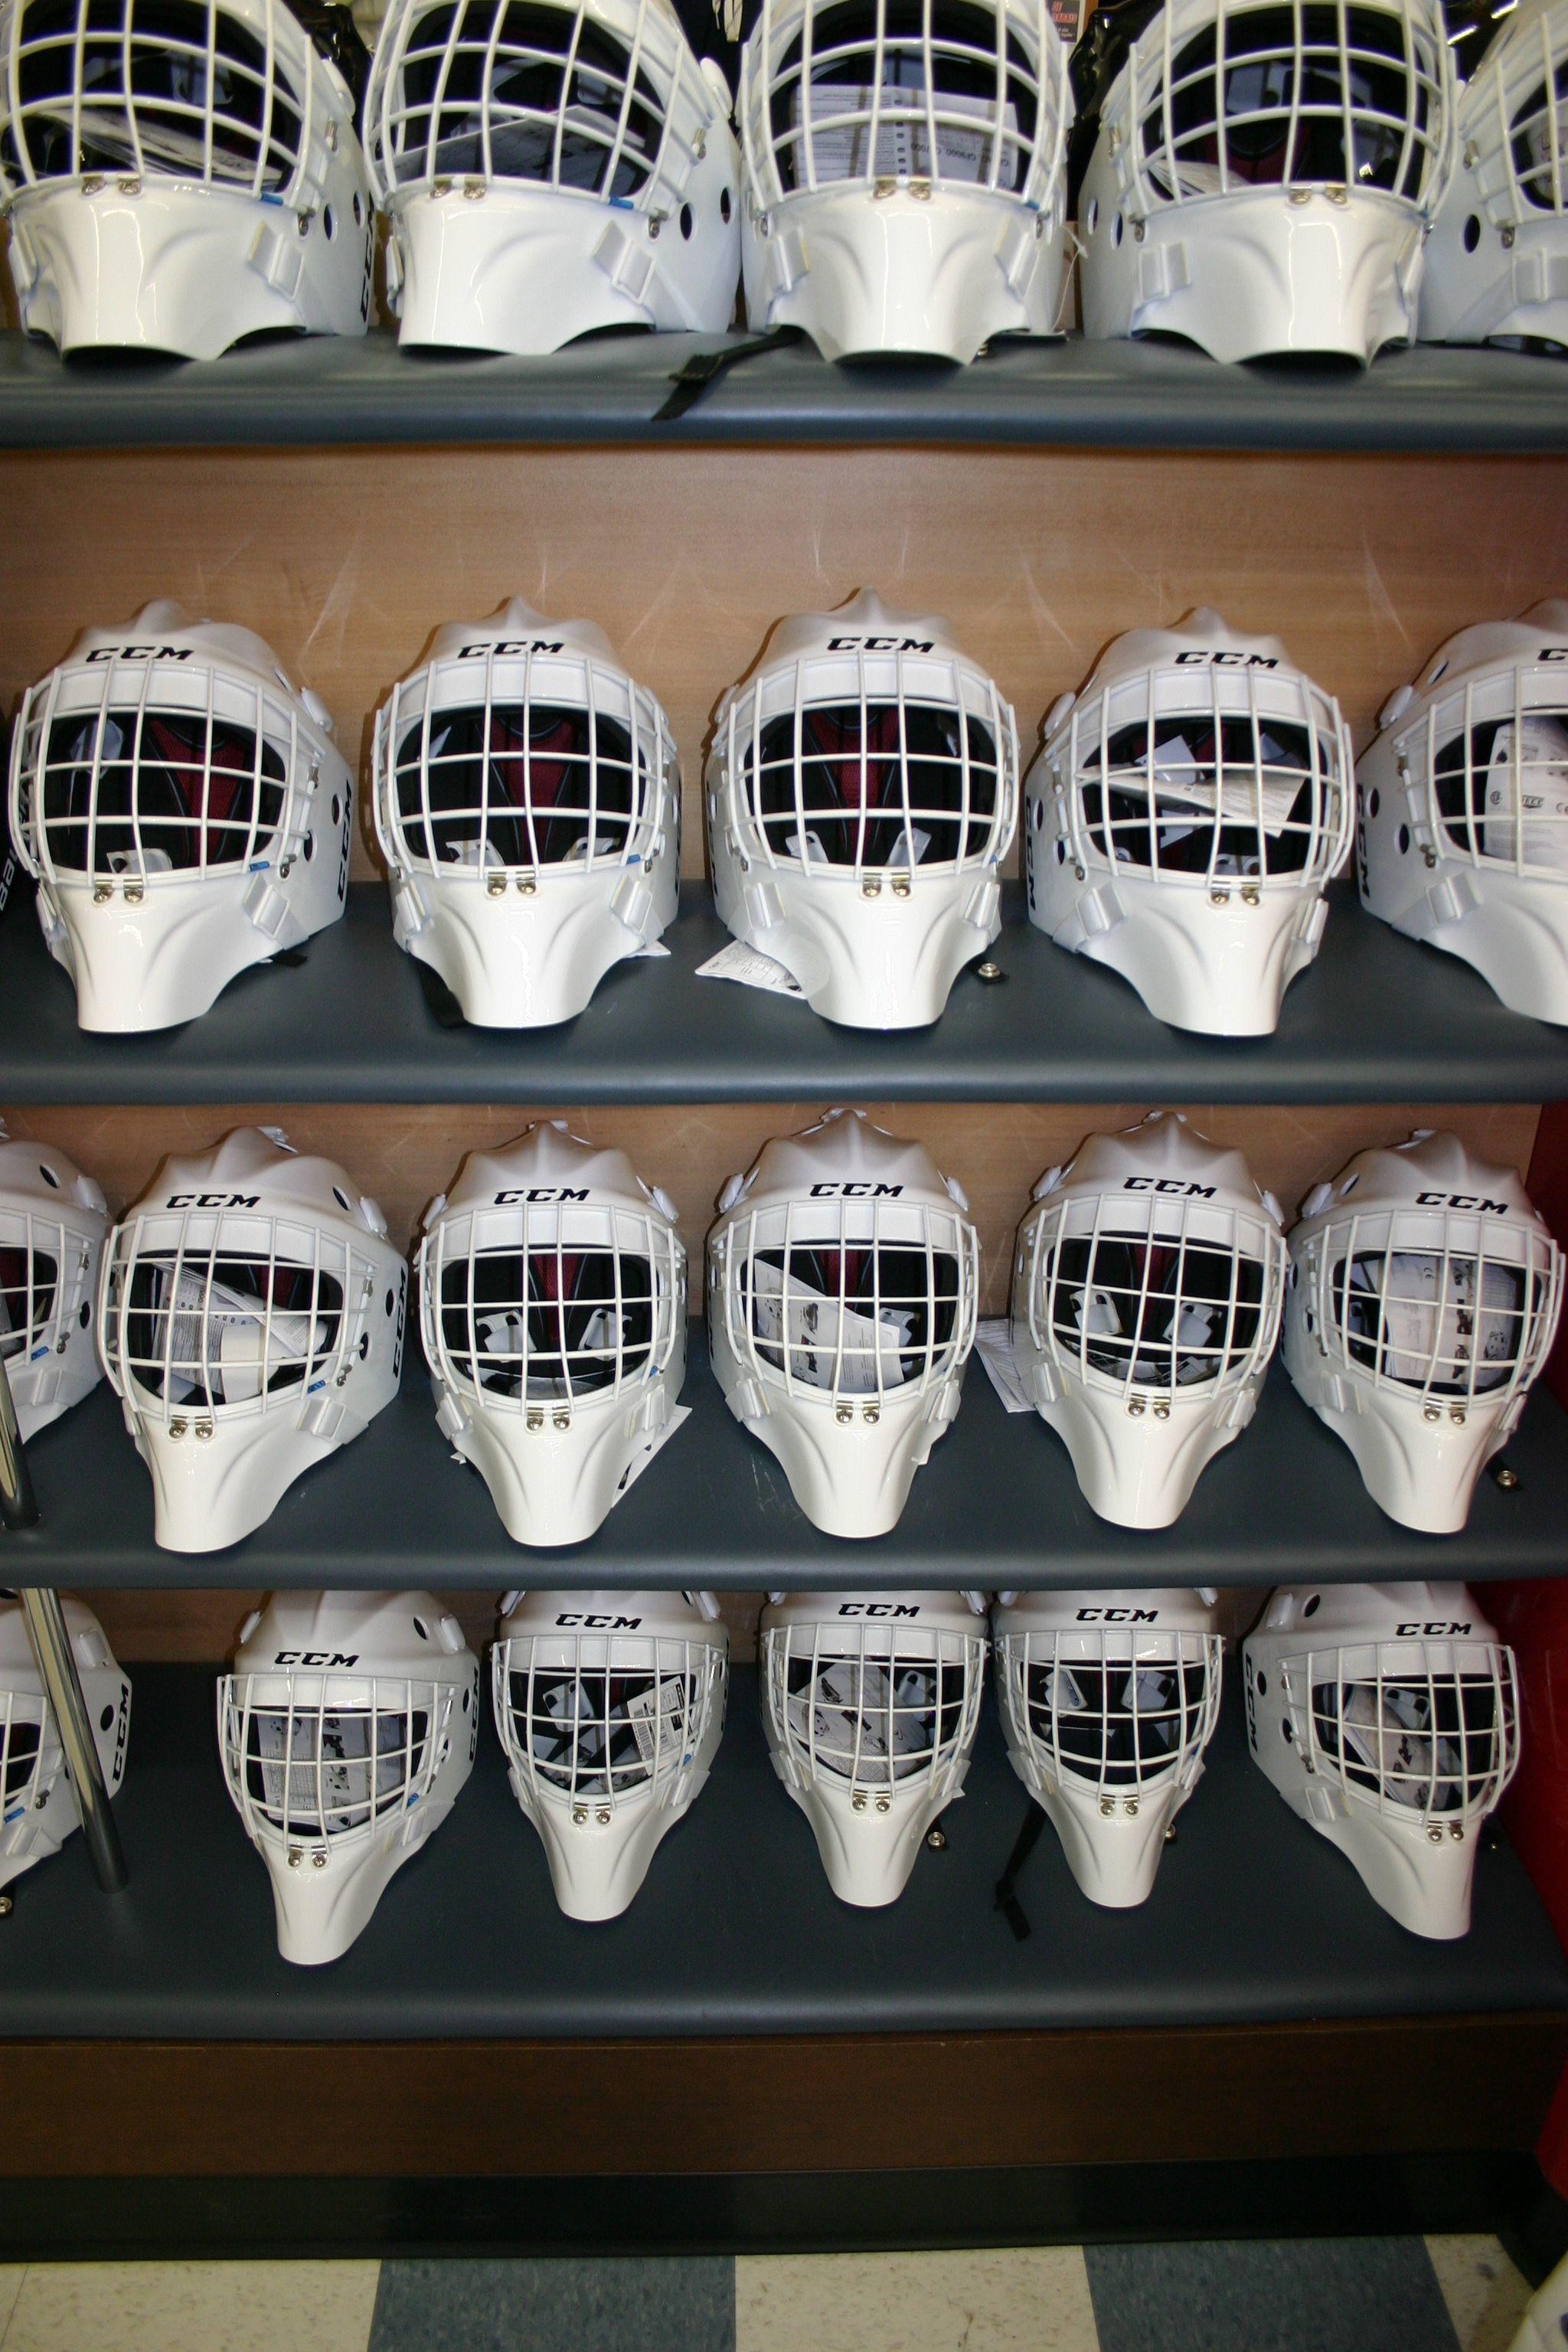 The New Ccm Goalie Masks Designed By Lefevre Are Now Available More Details At Http Www Prohockeylife Com Goalie Mask Football Helmets Goalie